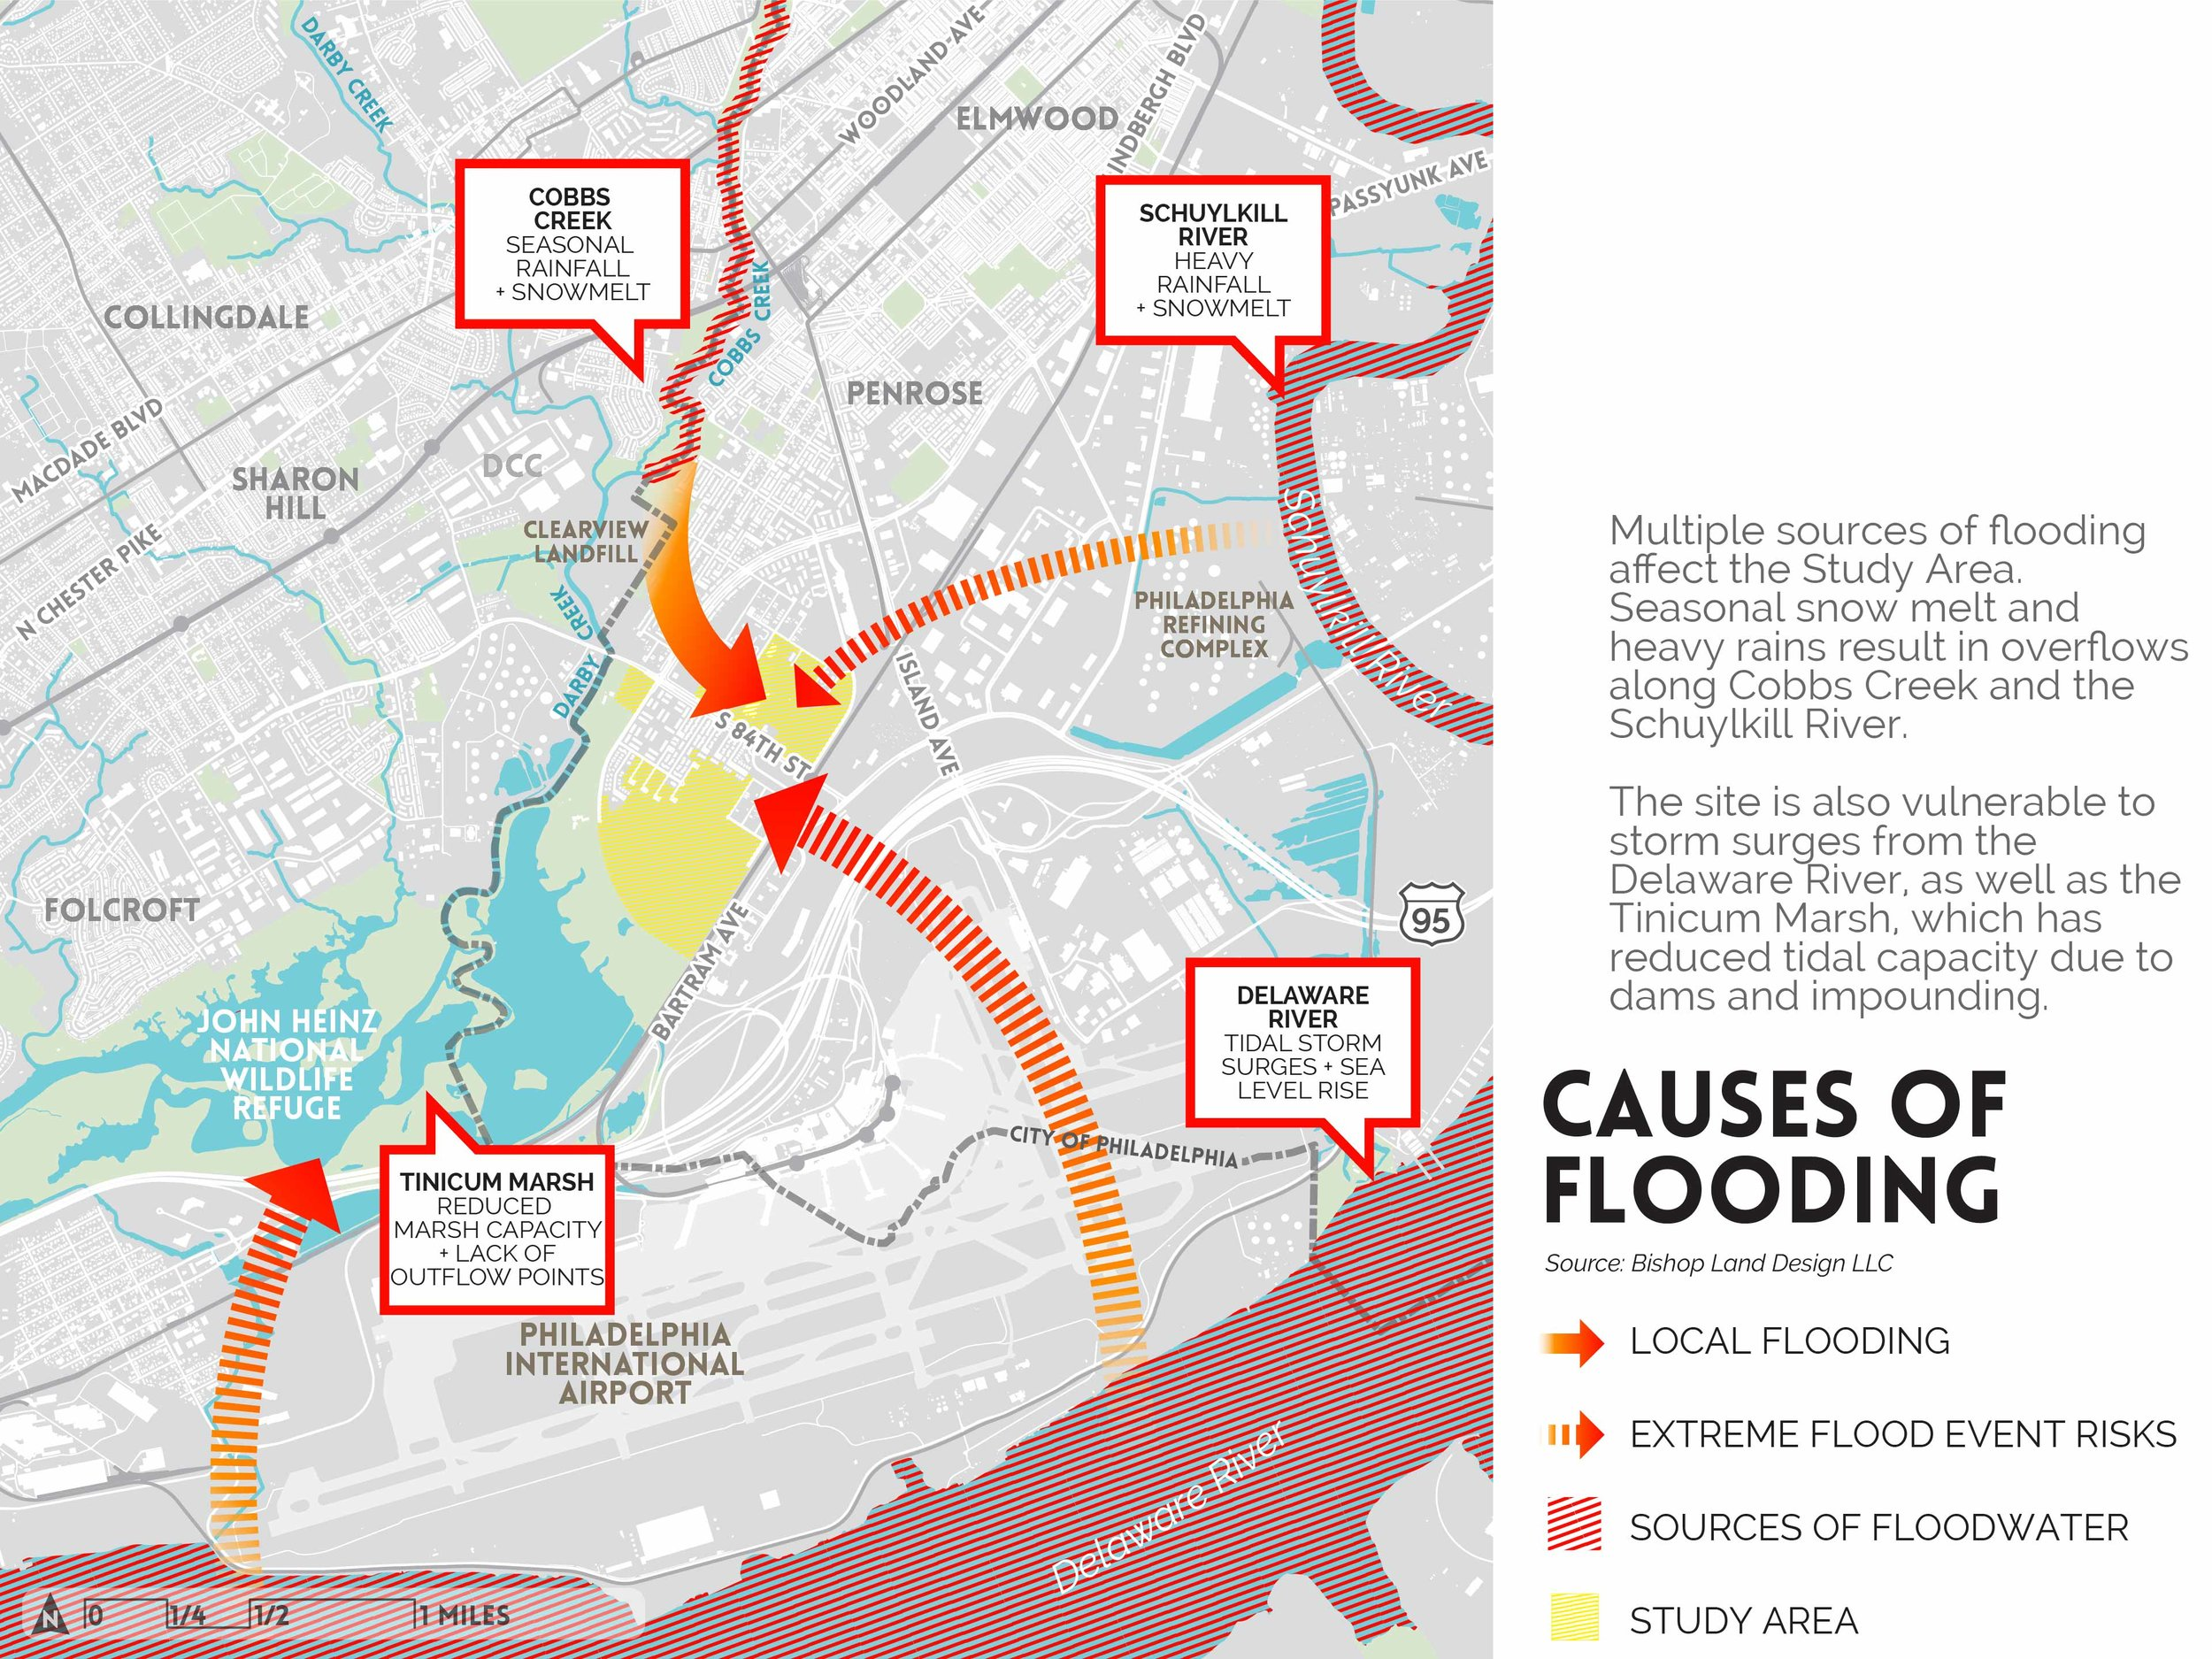 BLD_Eastwick_Context_Flooding_Rev-02.jpg